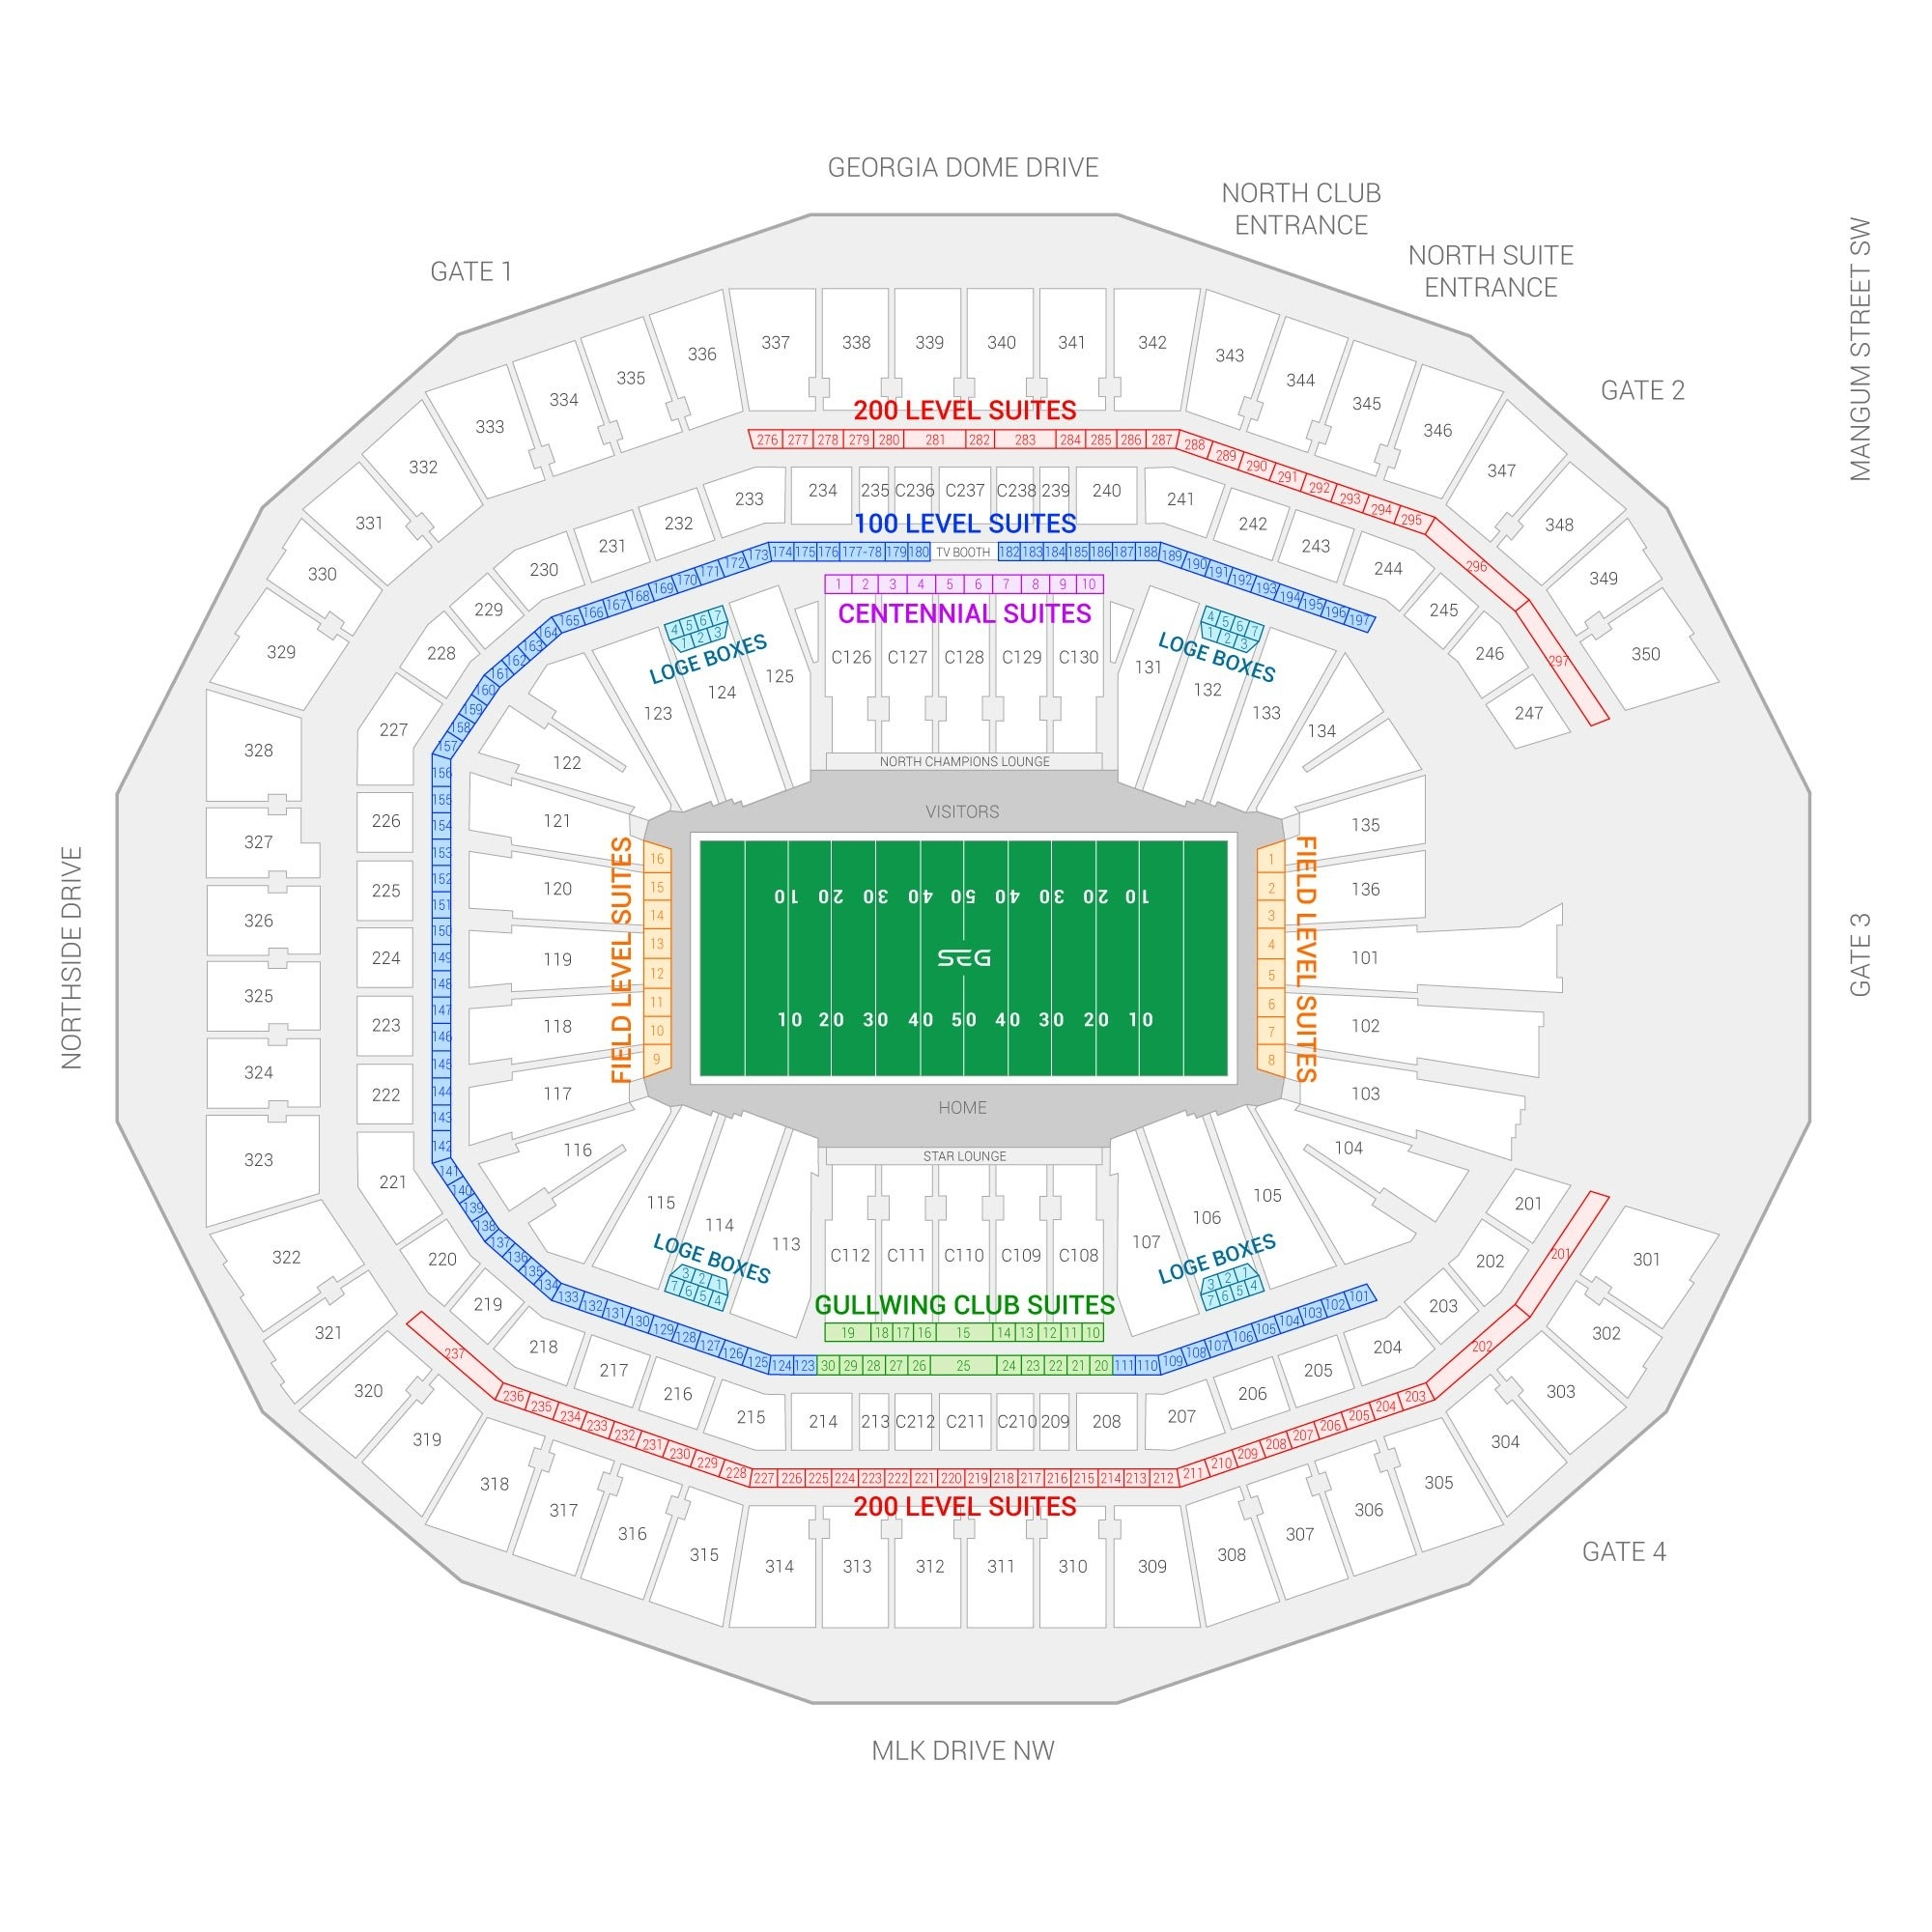 Super Bowl Liii Suite Rentals | Mercedes-Benz Stadium within Super Bowl Stadium Seating Chart